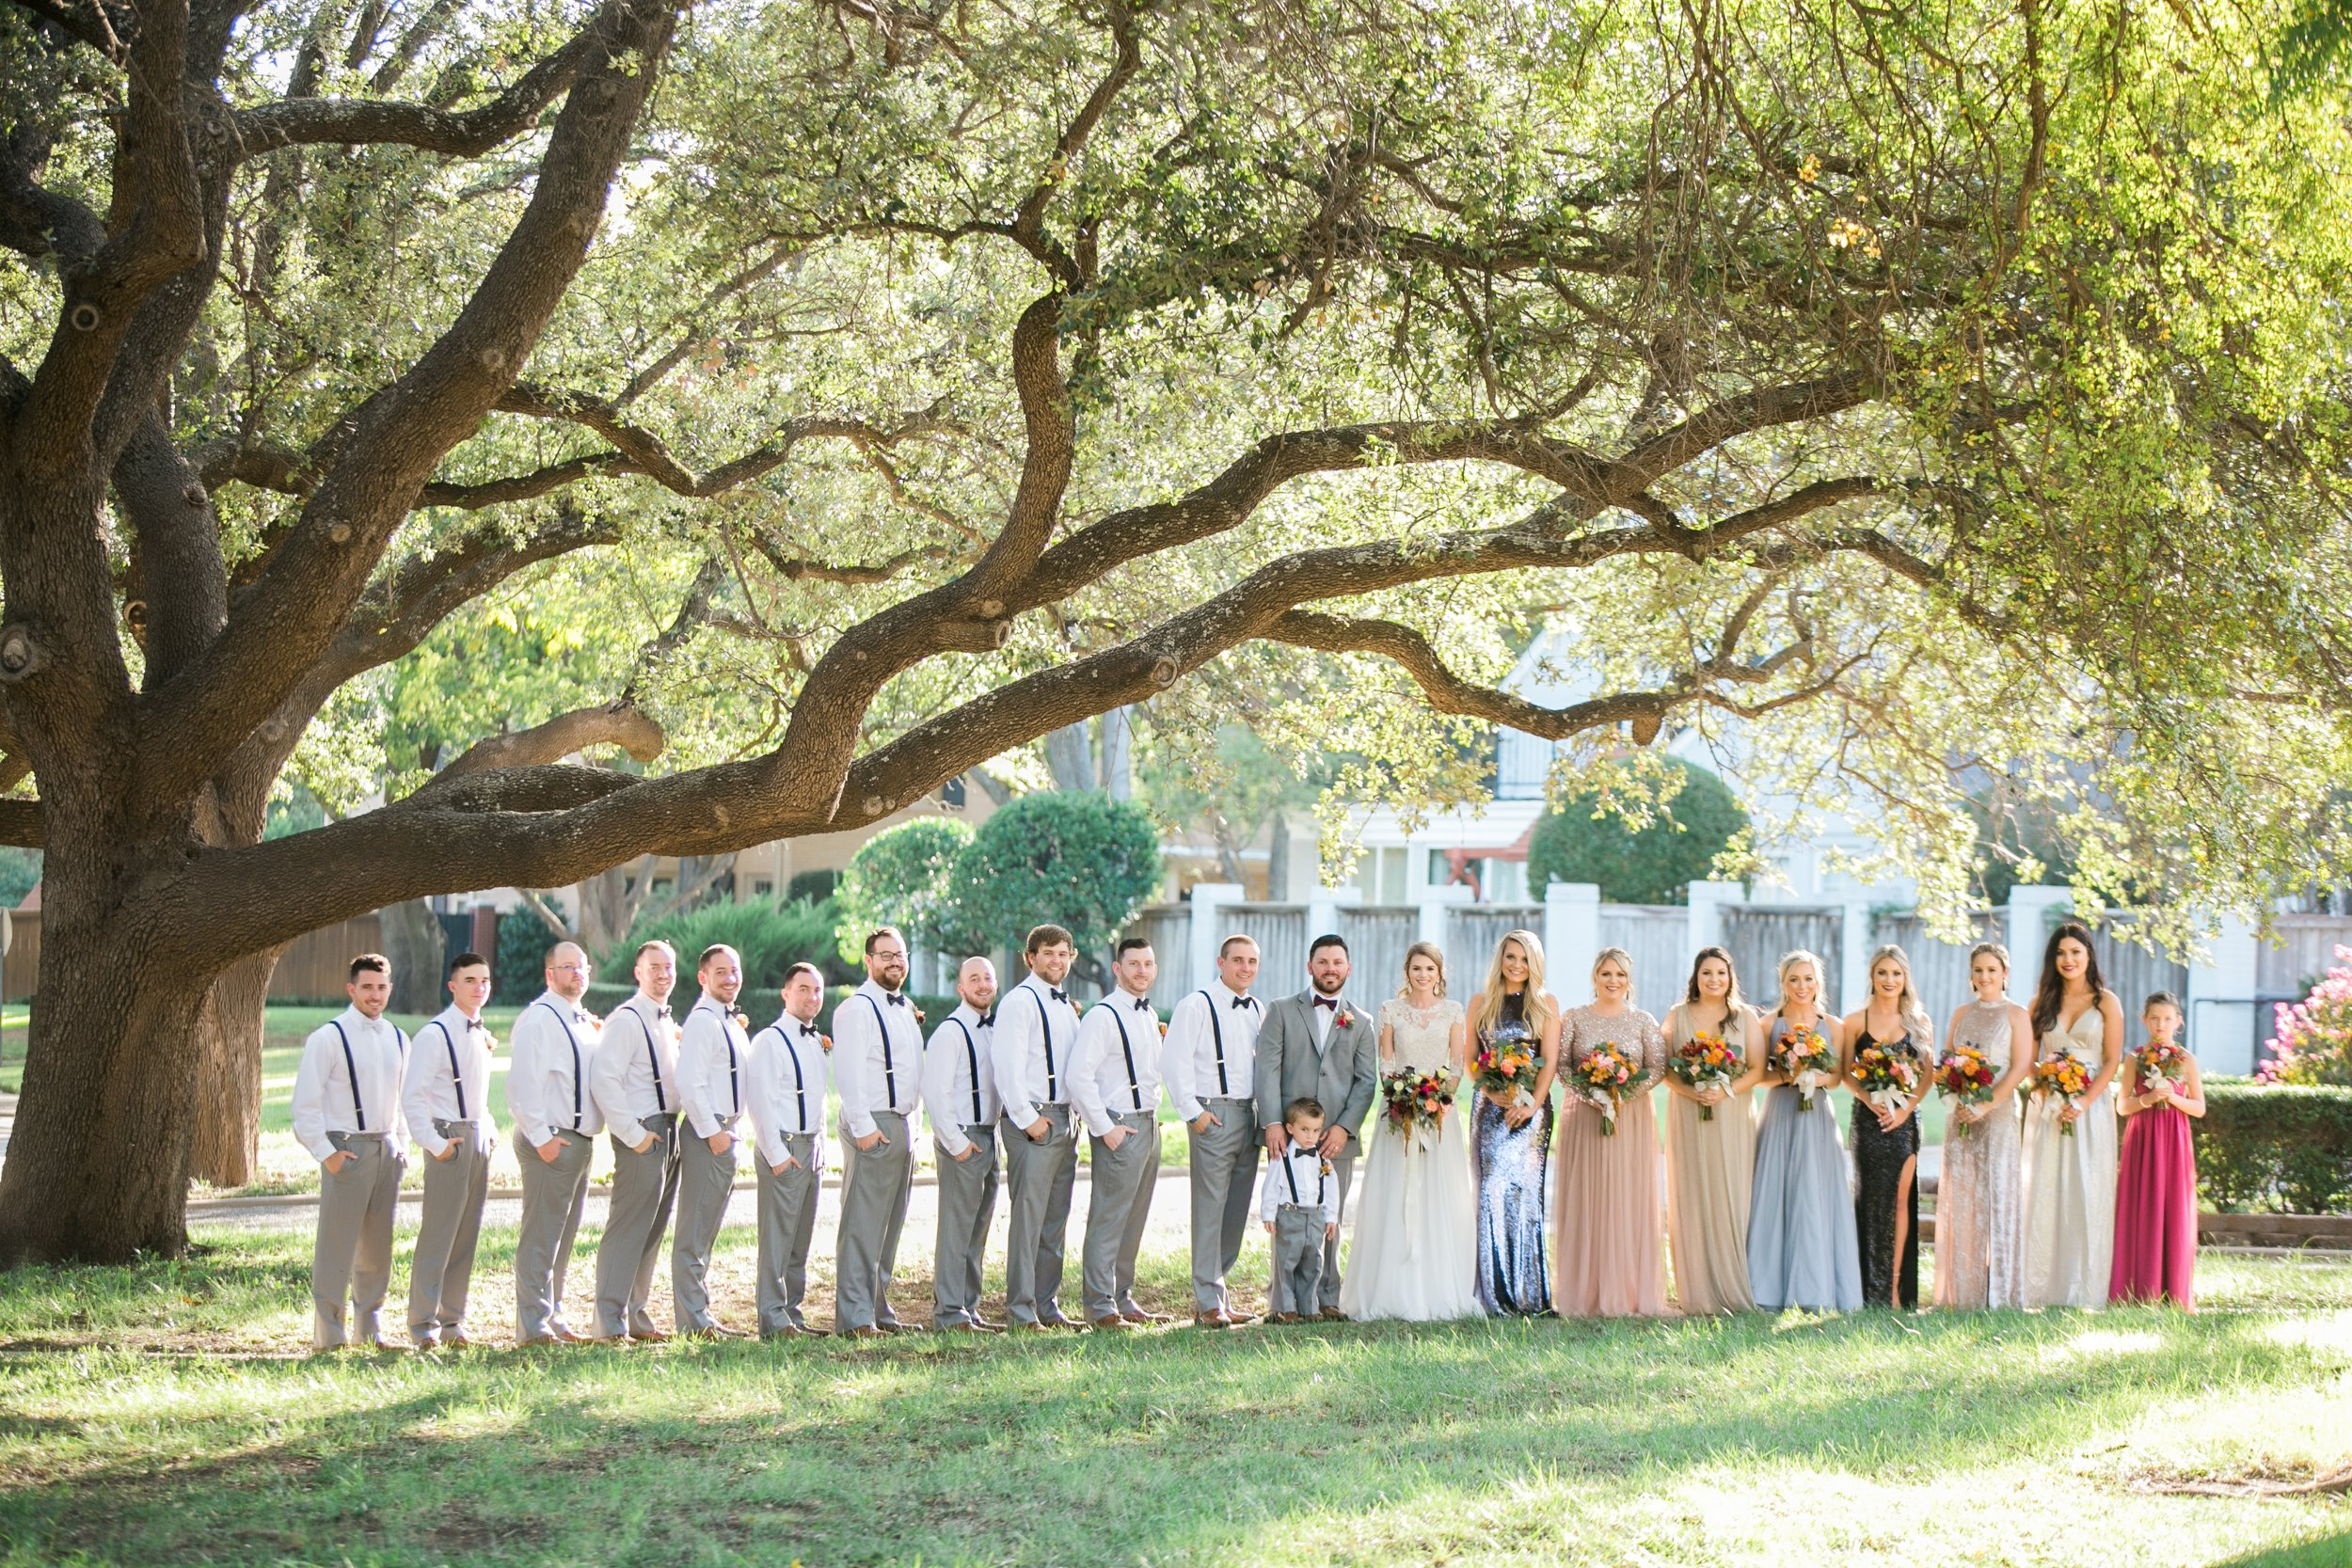 Roberson-Wedding-The-Forum-Lauren-Pinson-Wedding-Photography-Wichita-Falls-Texas-057.jpg